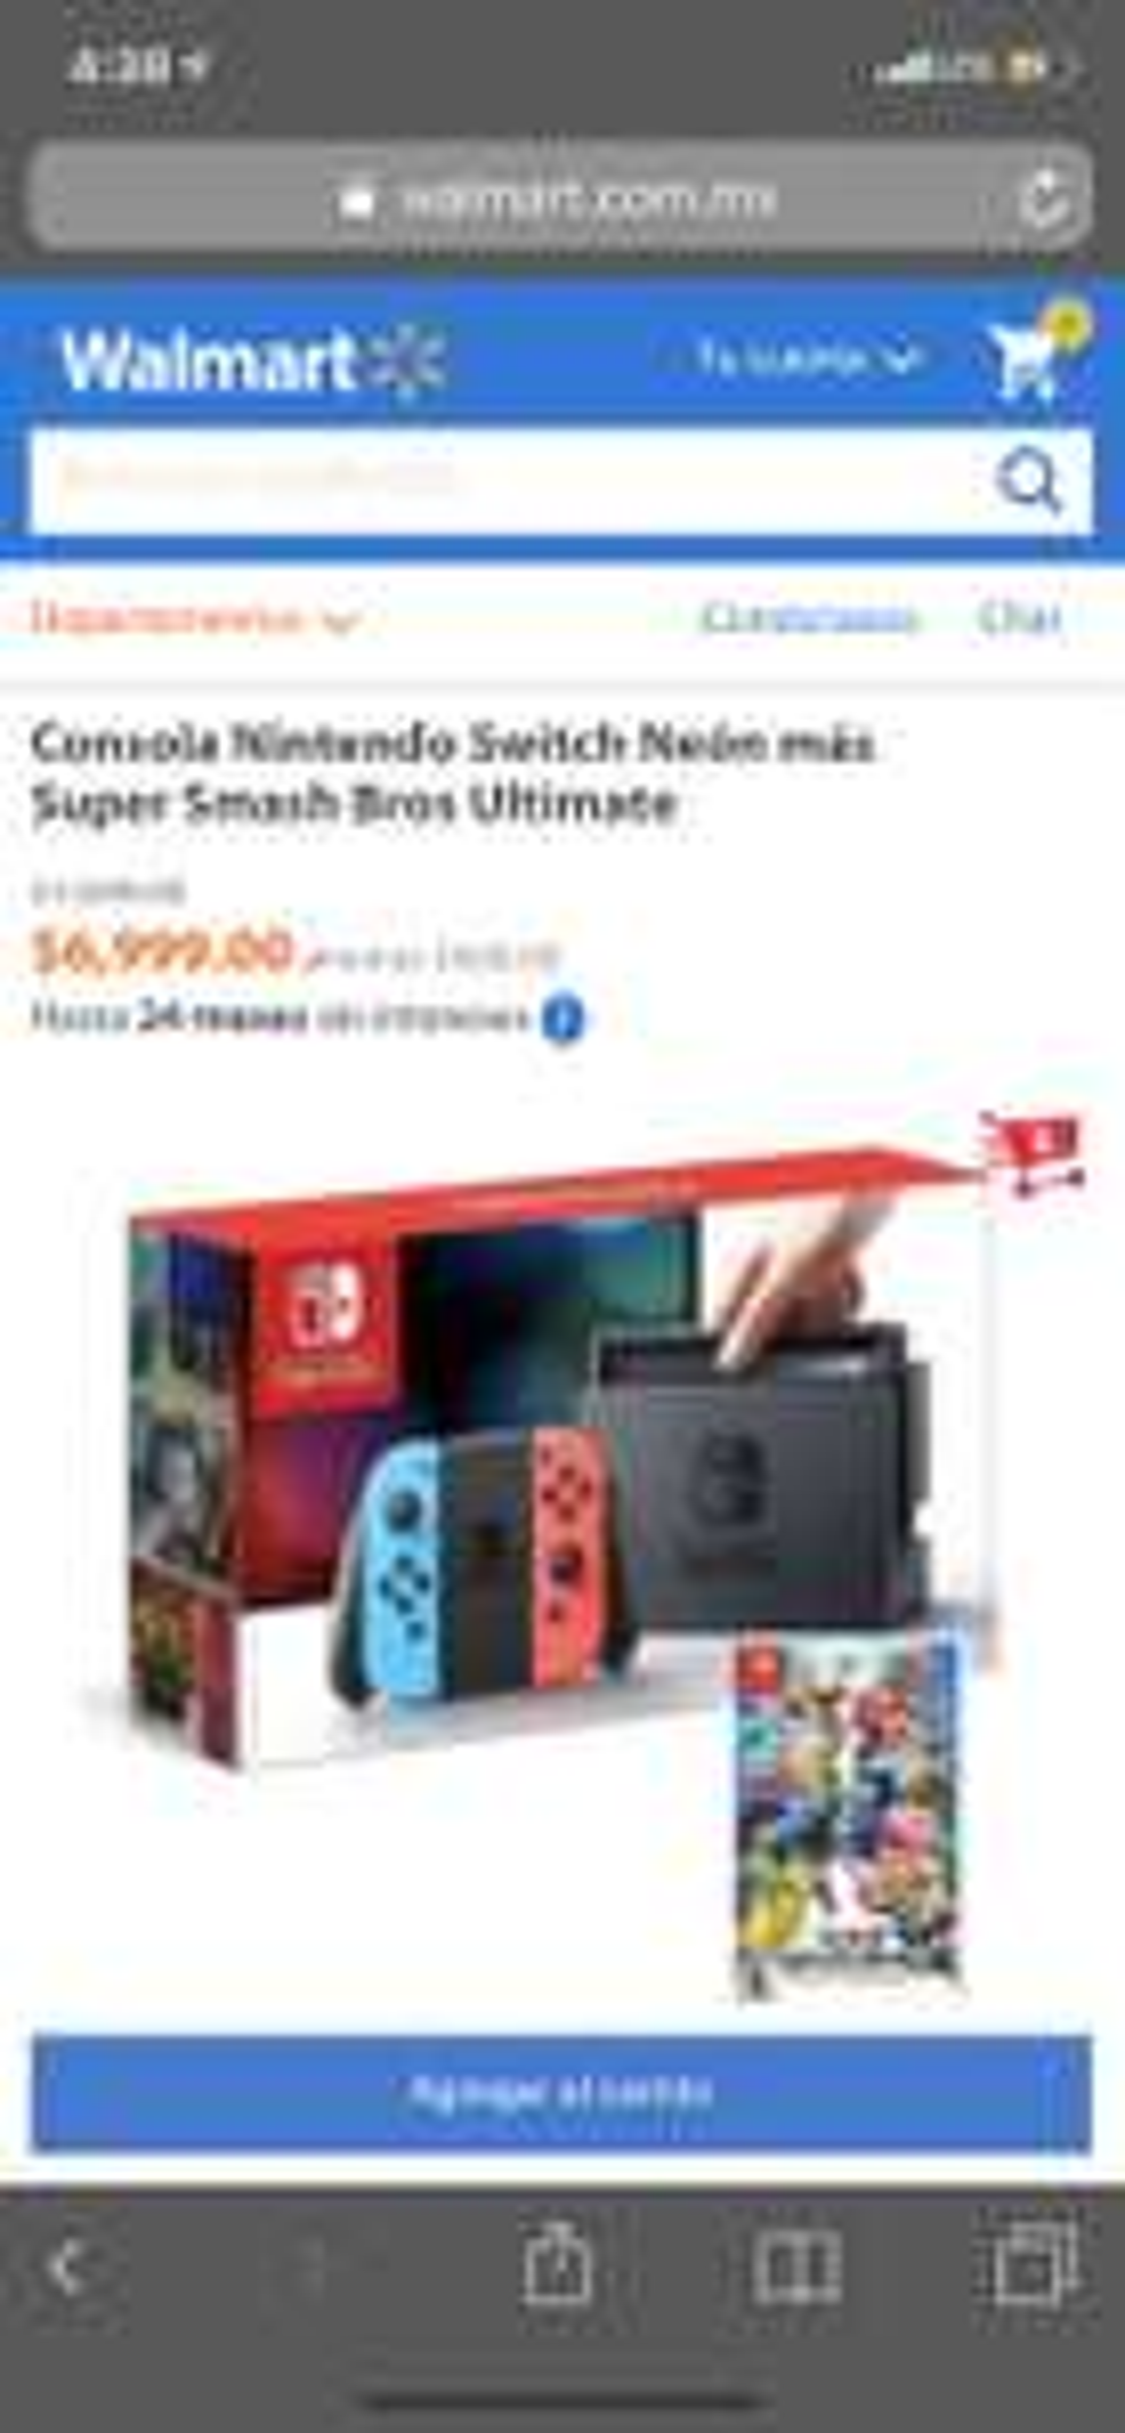 Hot Days 2019 Walmart: Nintendo Switch más Super Smash (Pagando con Bancomer o Inbursa)